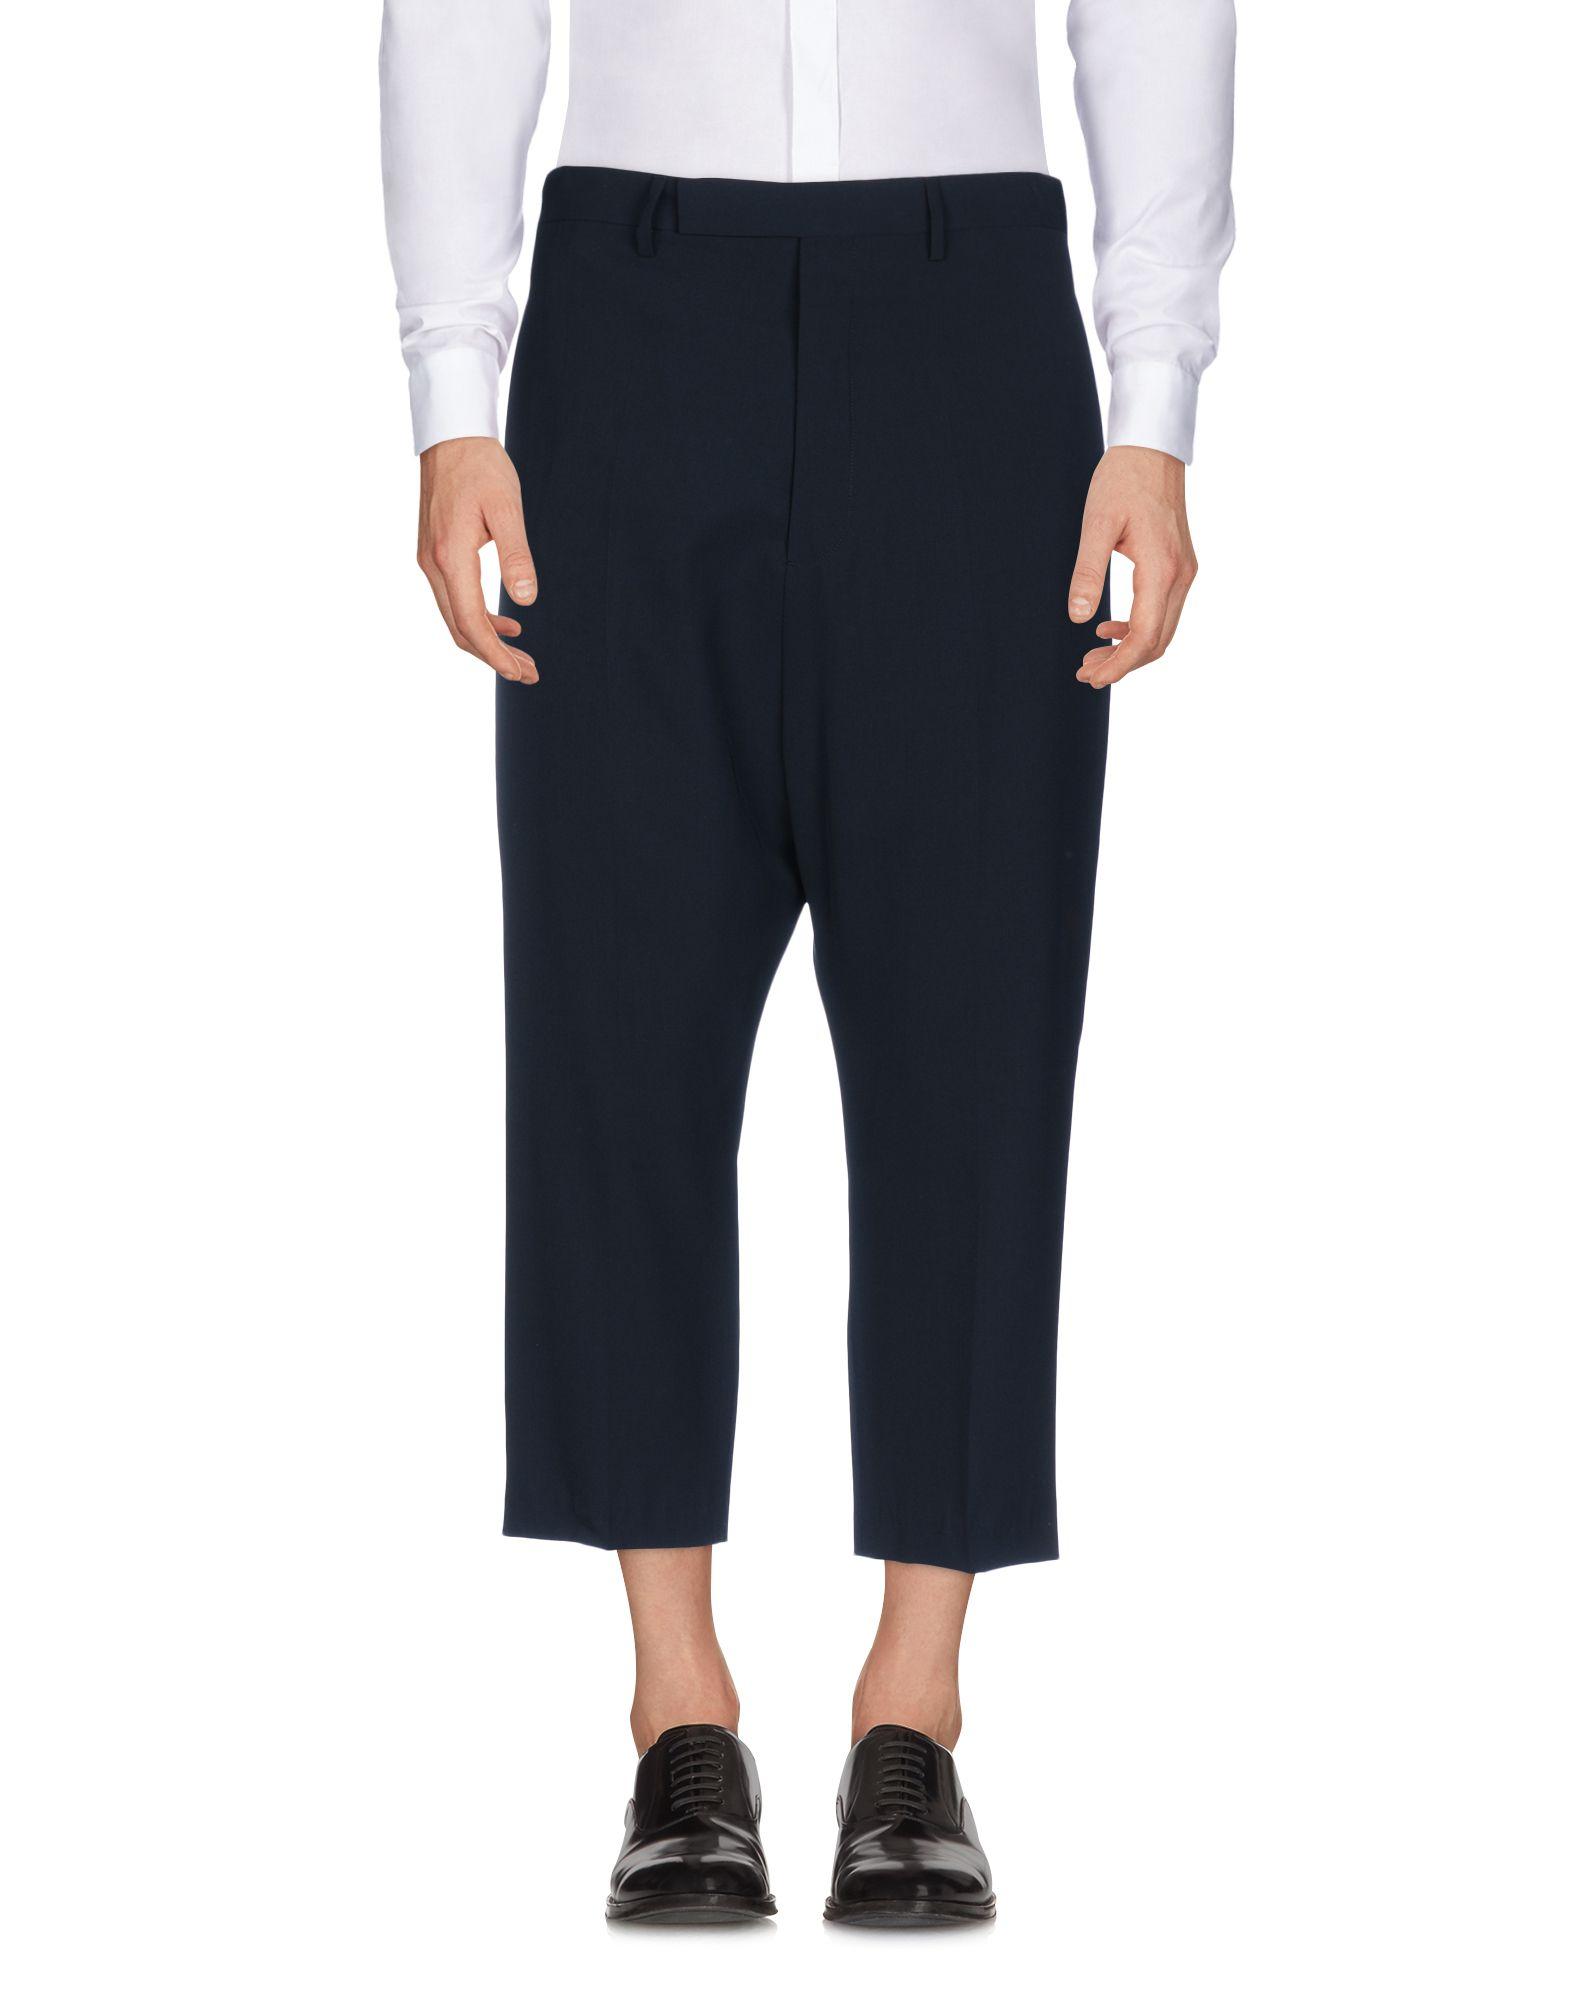 Pantalone Classico Rick Owens Uomo - Acquista online su